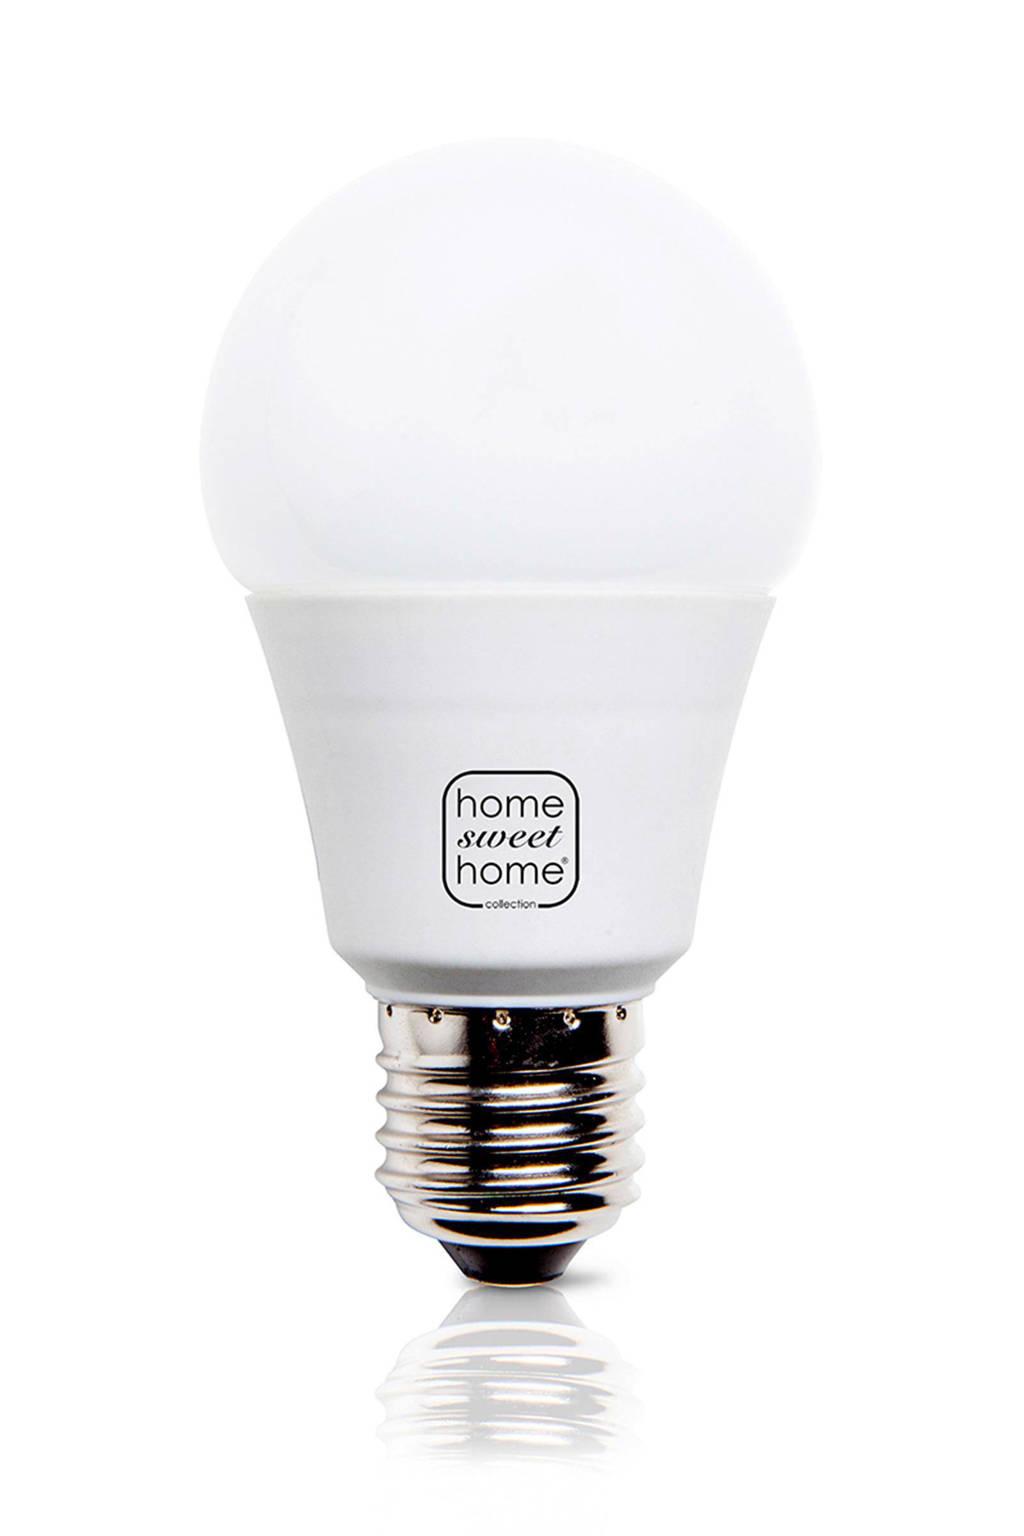 home sweet home LED lamp (6,8W E27)